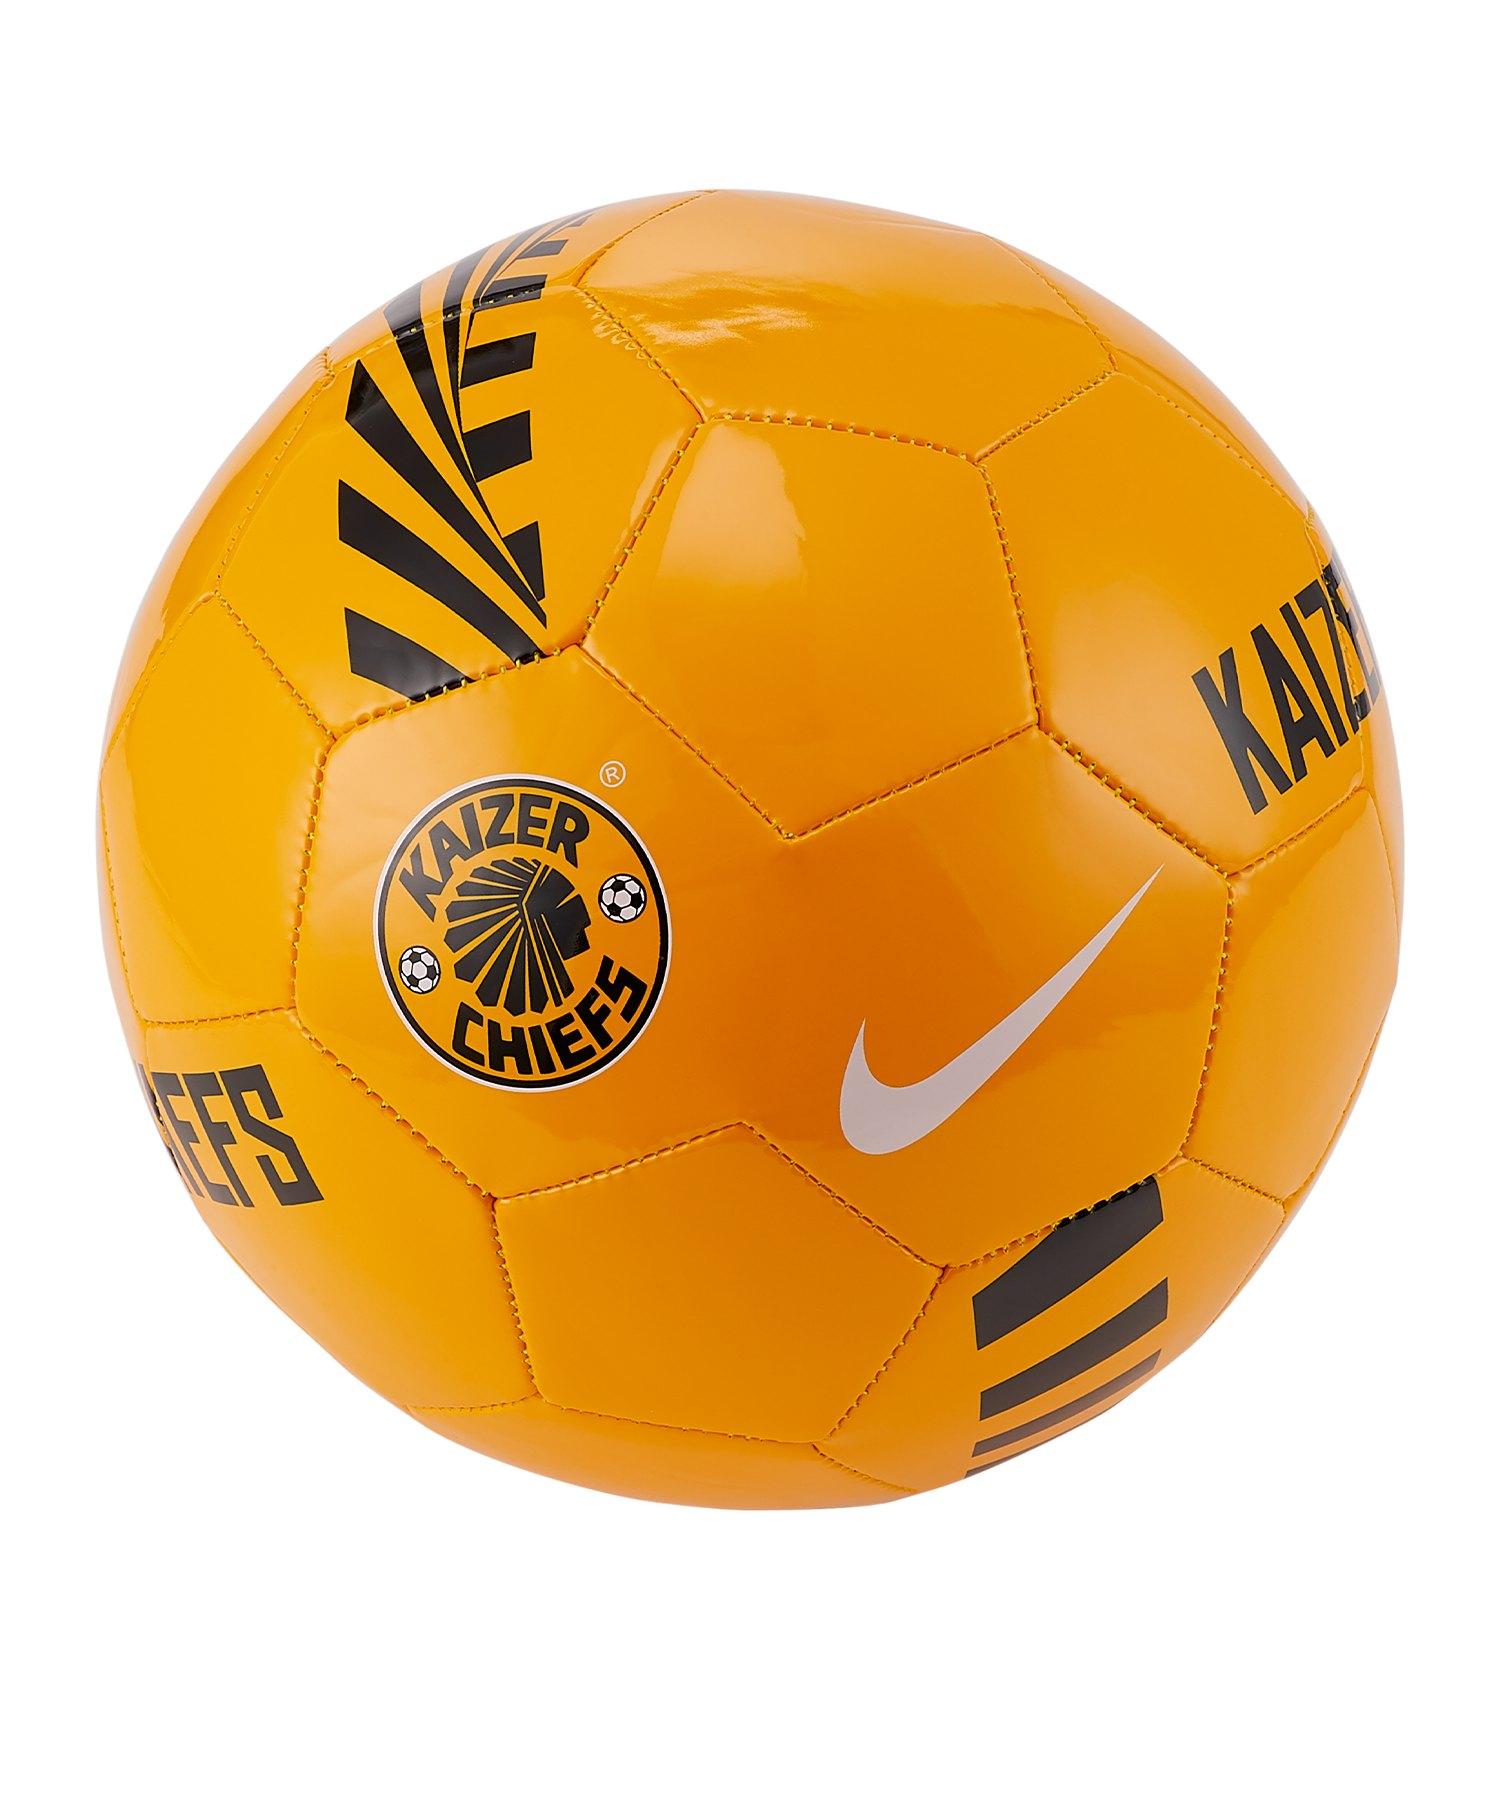 Nike Kaizer Chiefs Trainingsball Gelb F705 - gelb